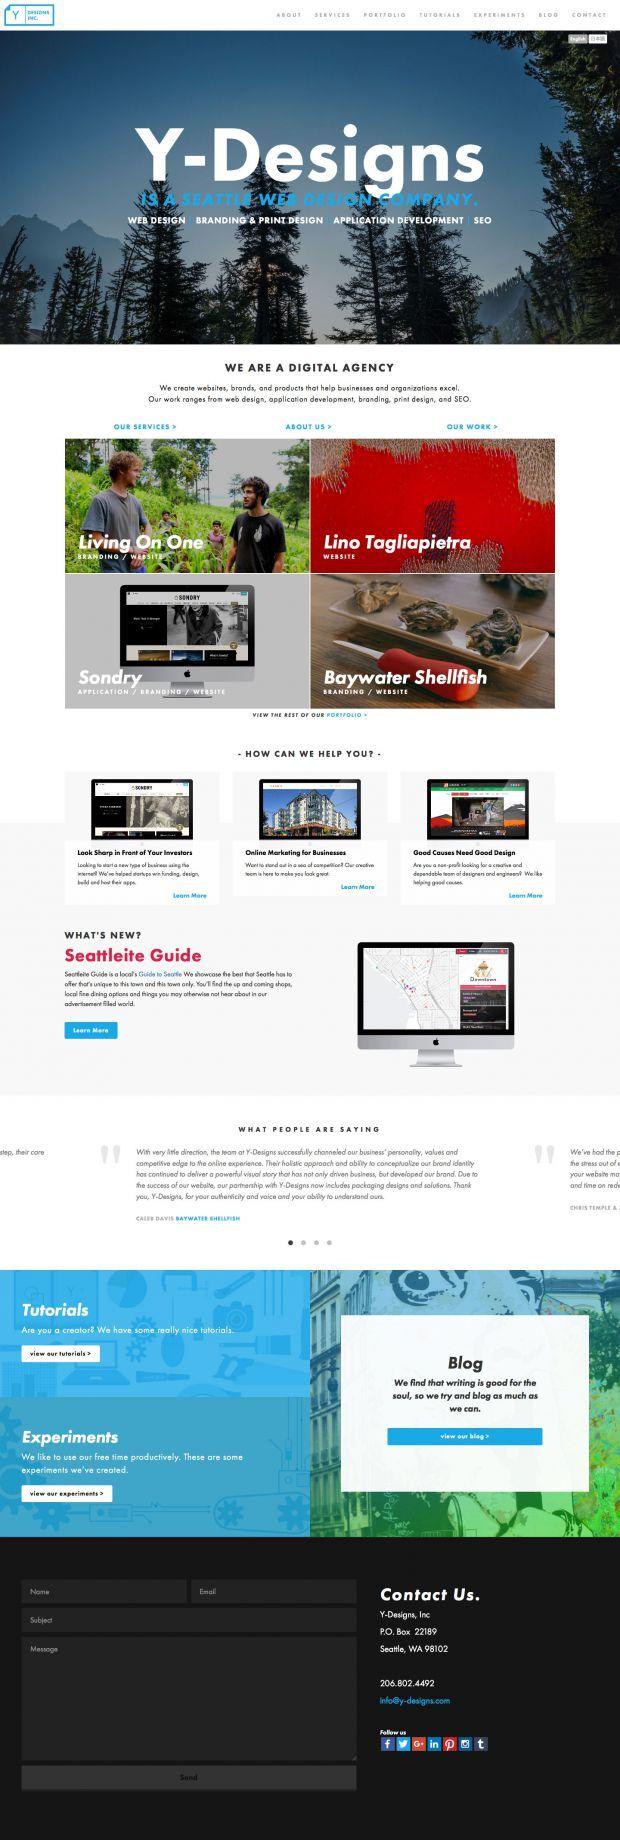 Seattle Web Design And Web Dev Y Designs Webdesign Inspiration On Www Niceoneilike Com Web Design Inspiration Web Design Web Design Company